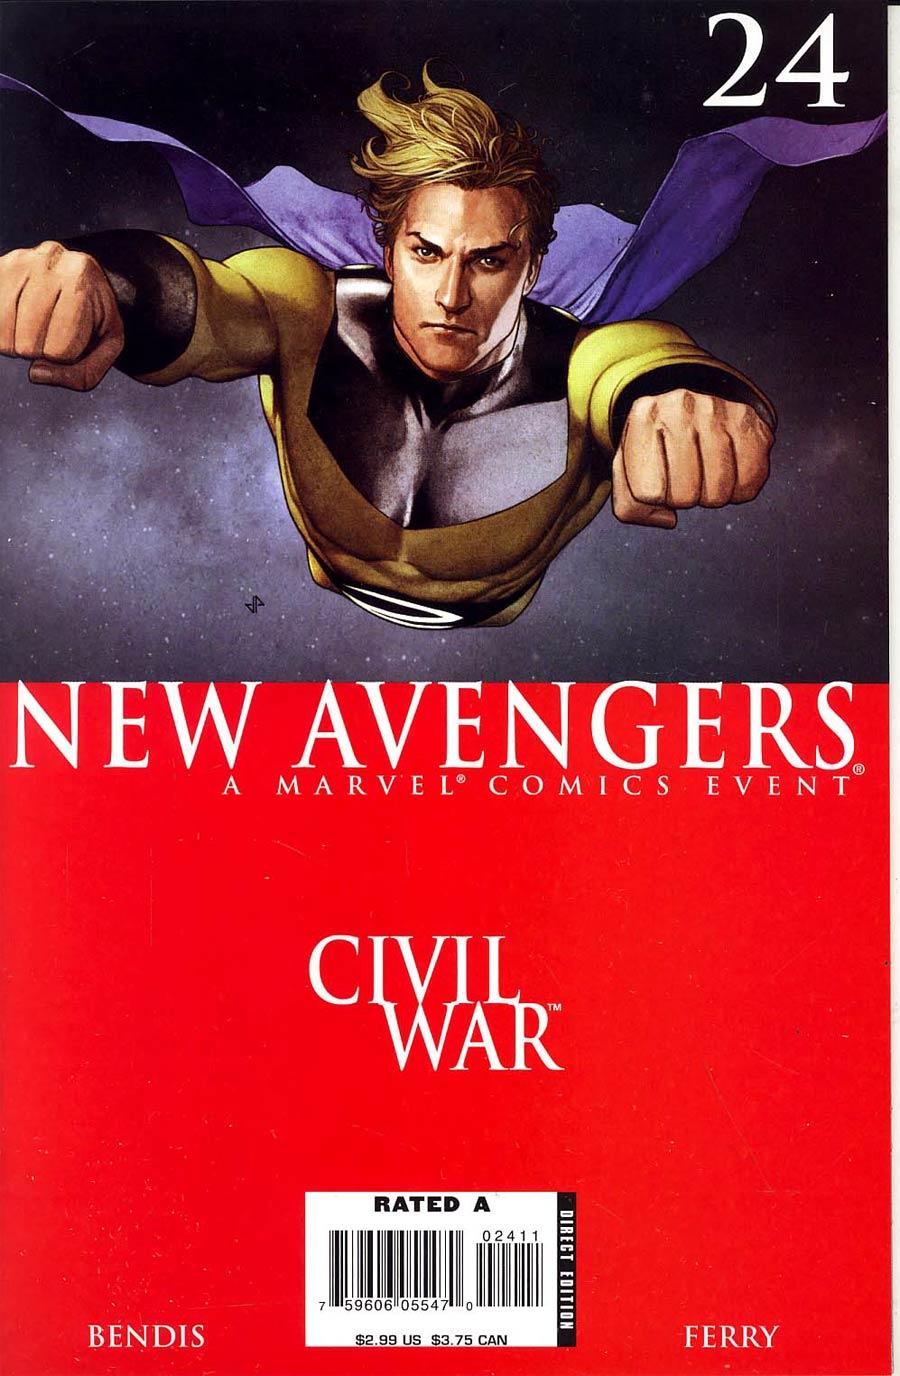 New Avengers #24 (Civil War Tie-In)